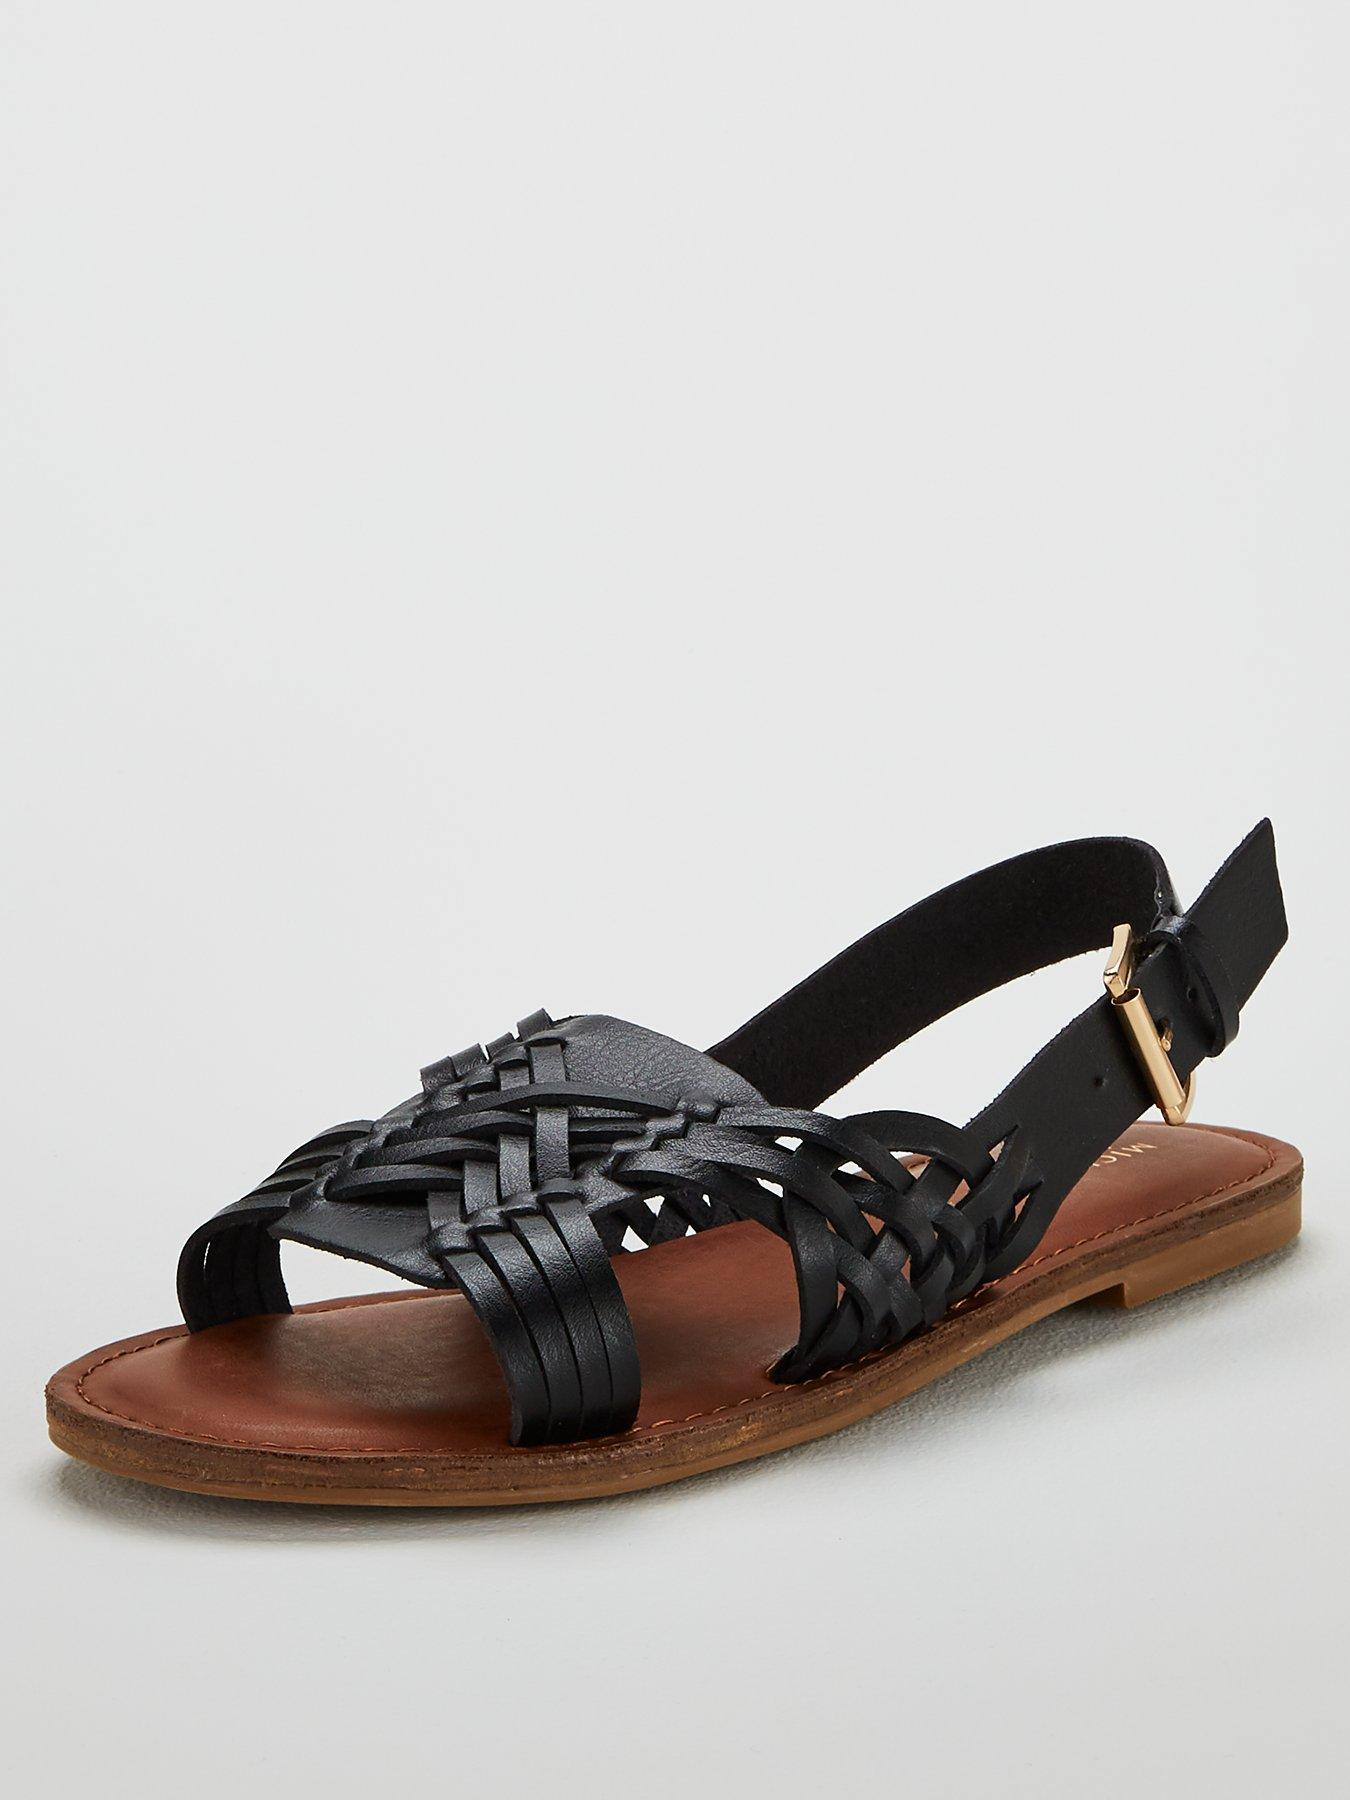 Clothes, Shoes & Accessories The Best Black Female Sandals Uk Size 6.5